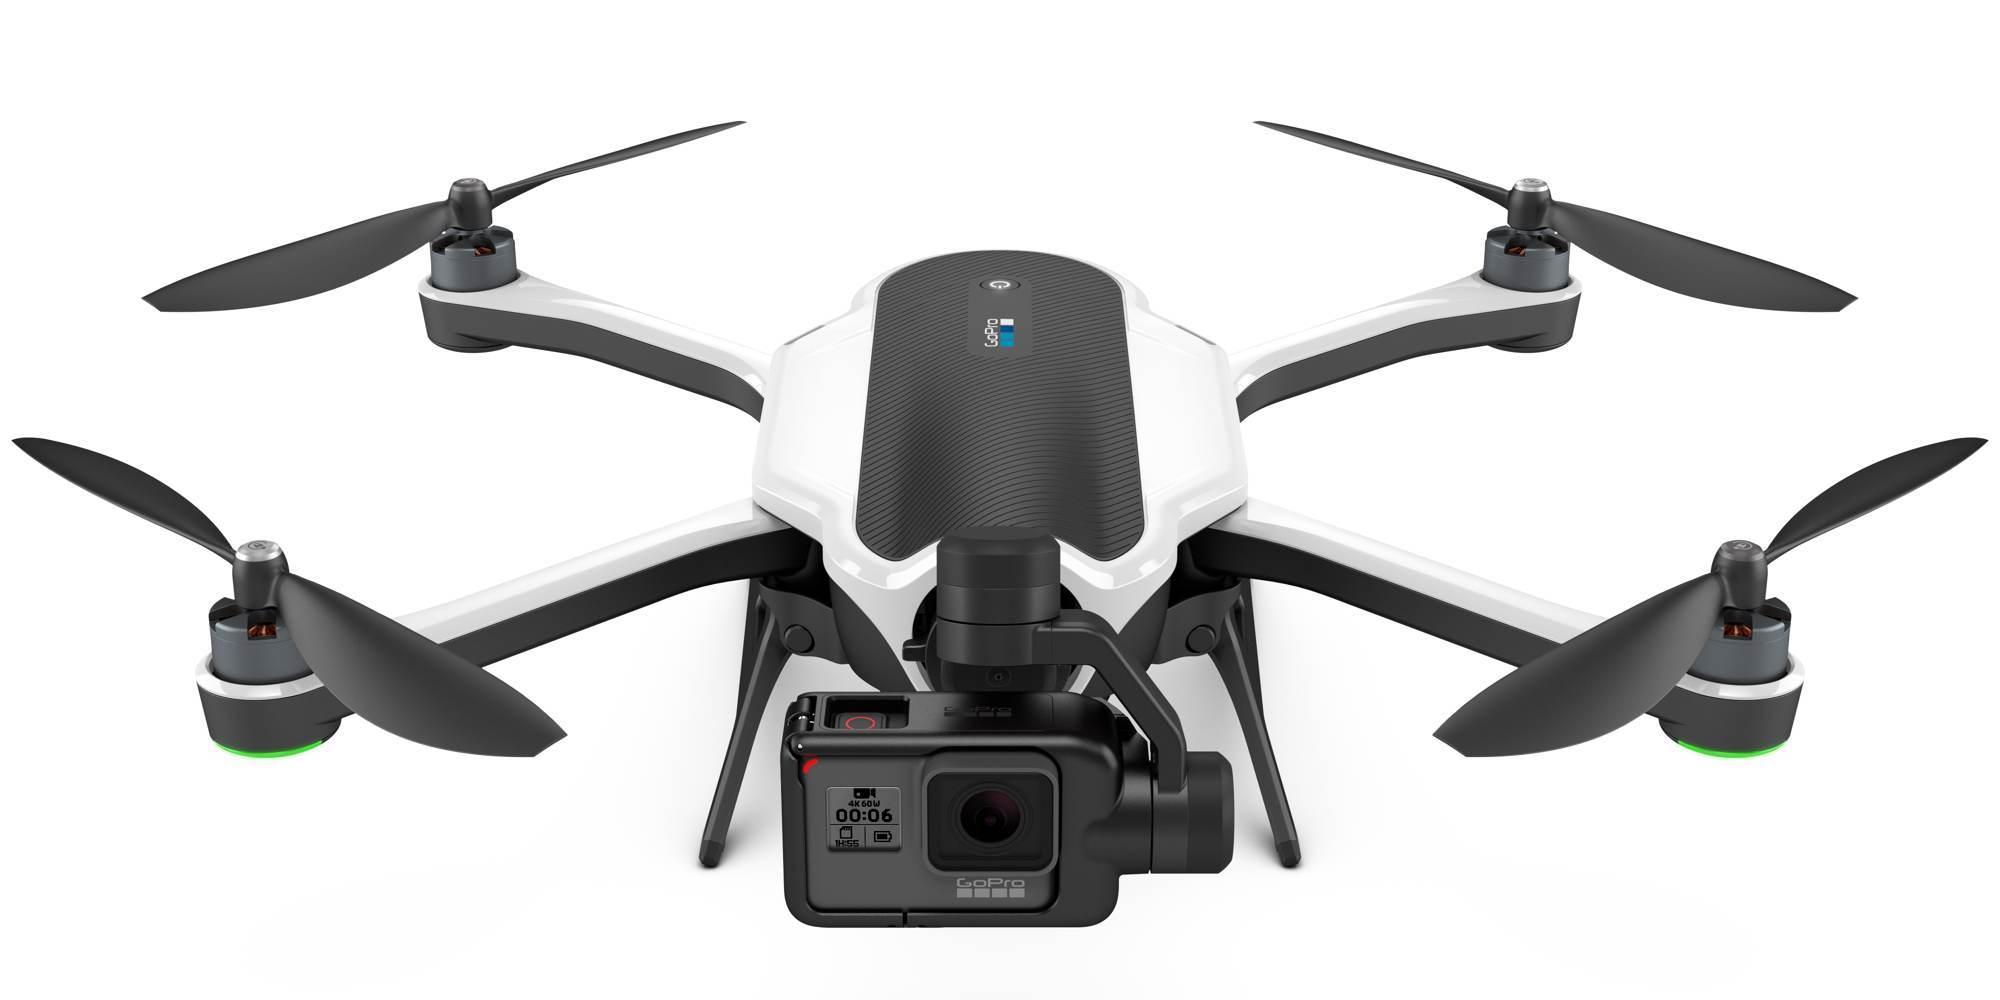 Квадрокоптер GoPro Karma + камера HERO6 Black (QKWXX-601-EU)